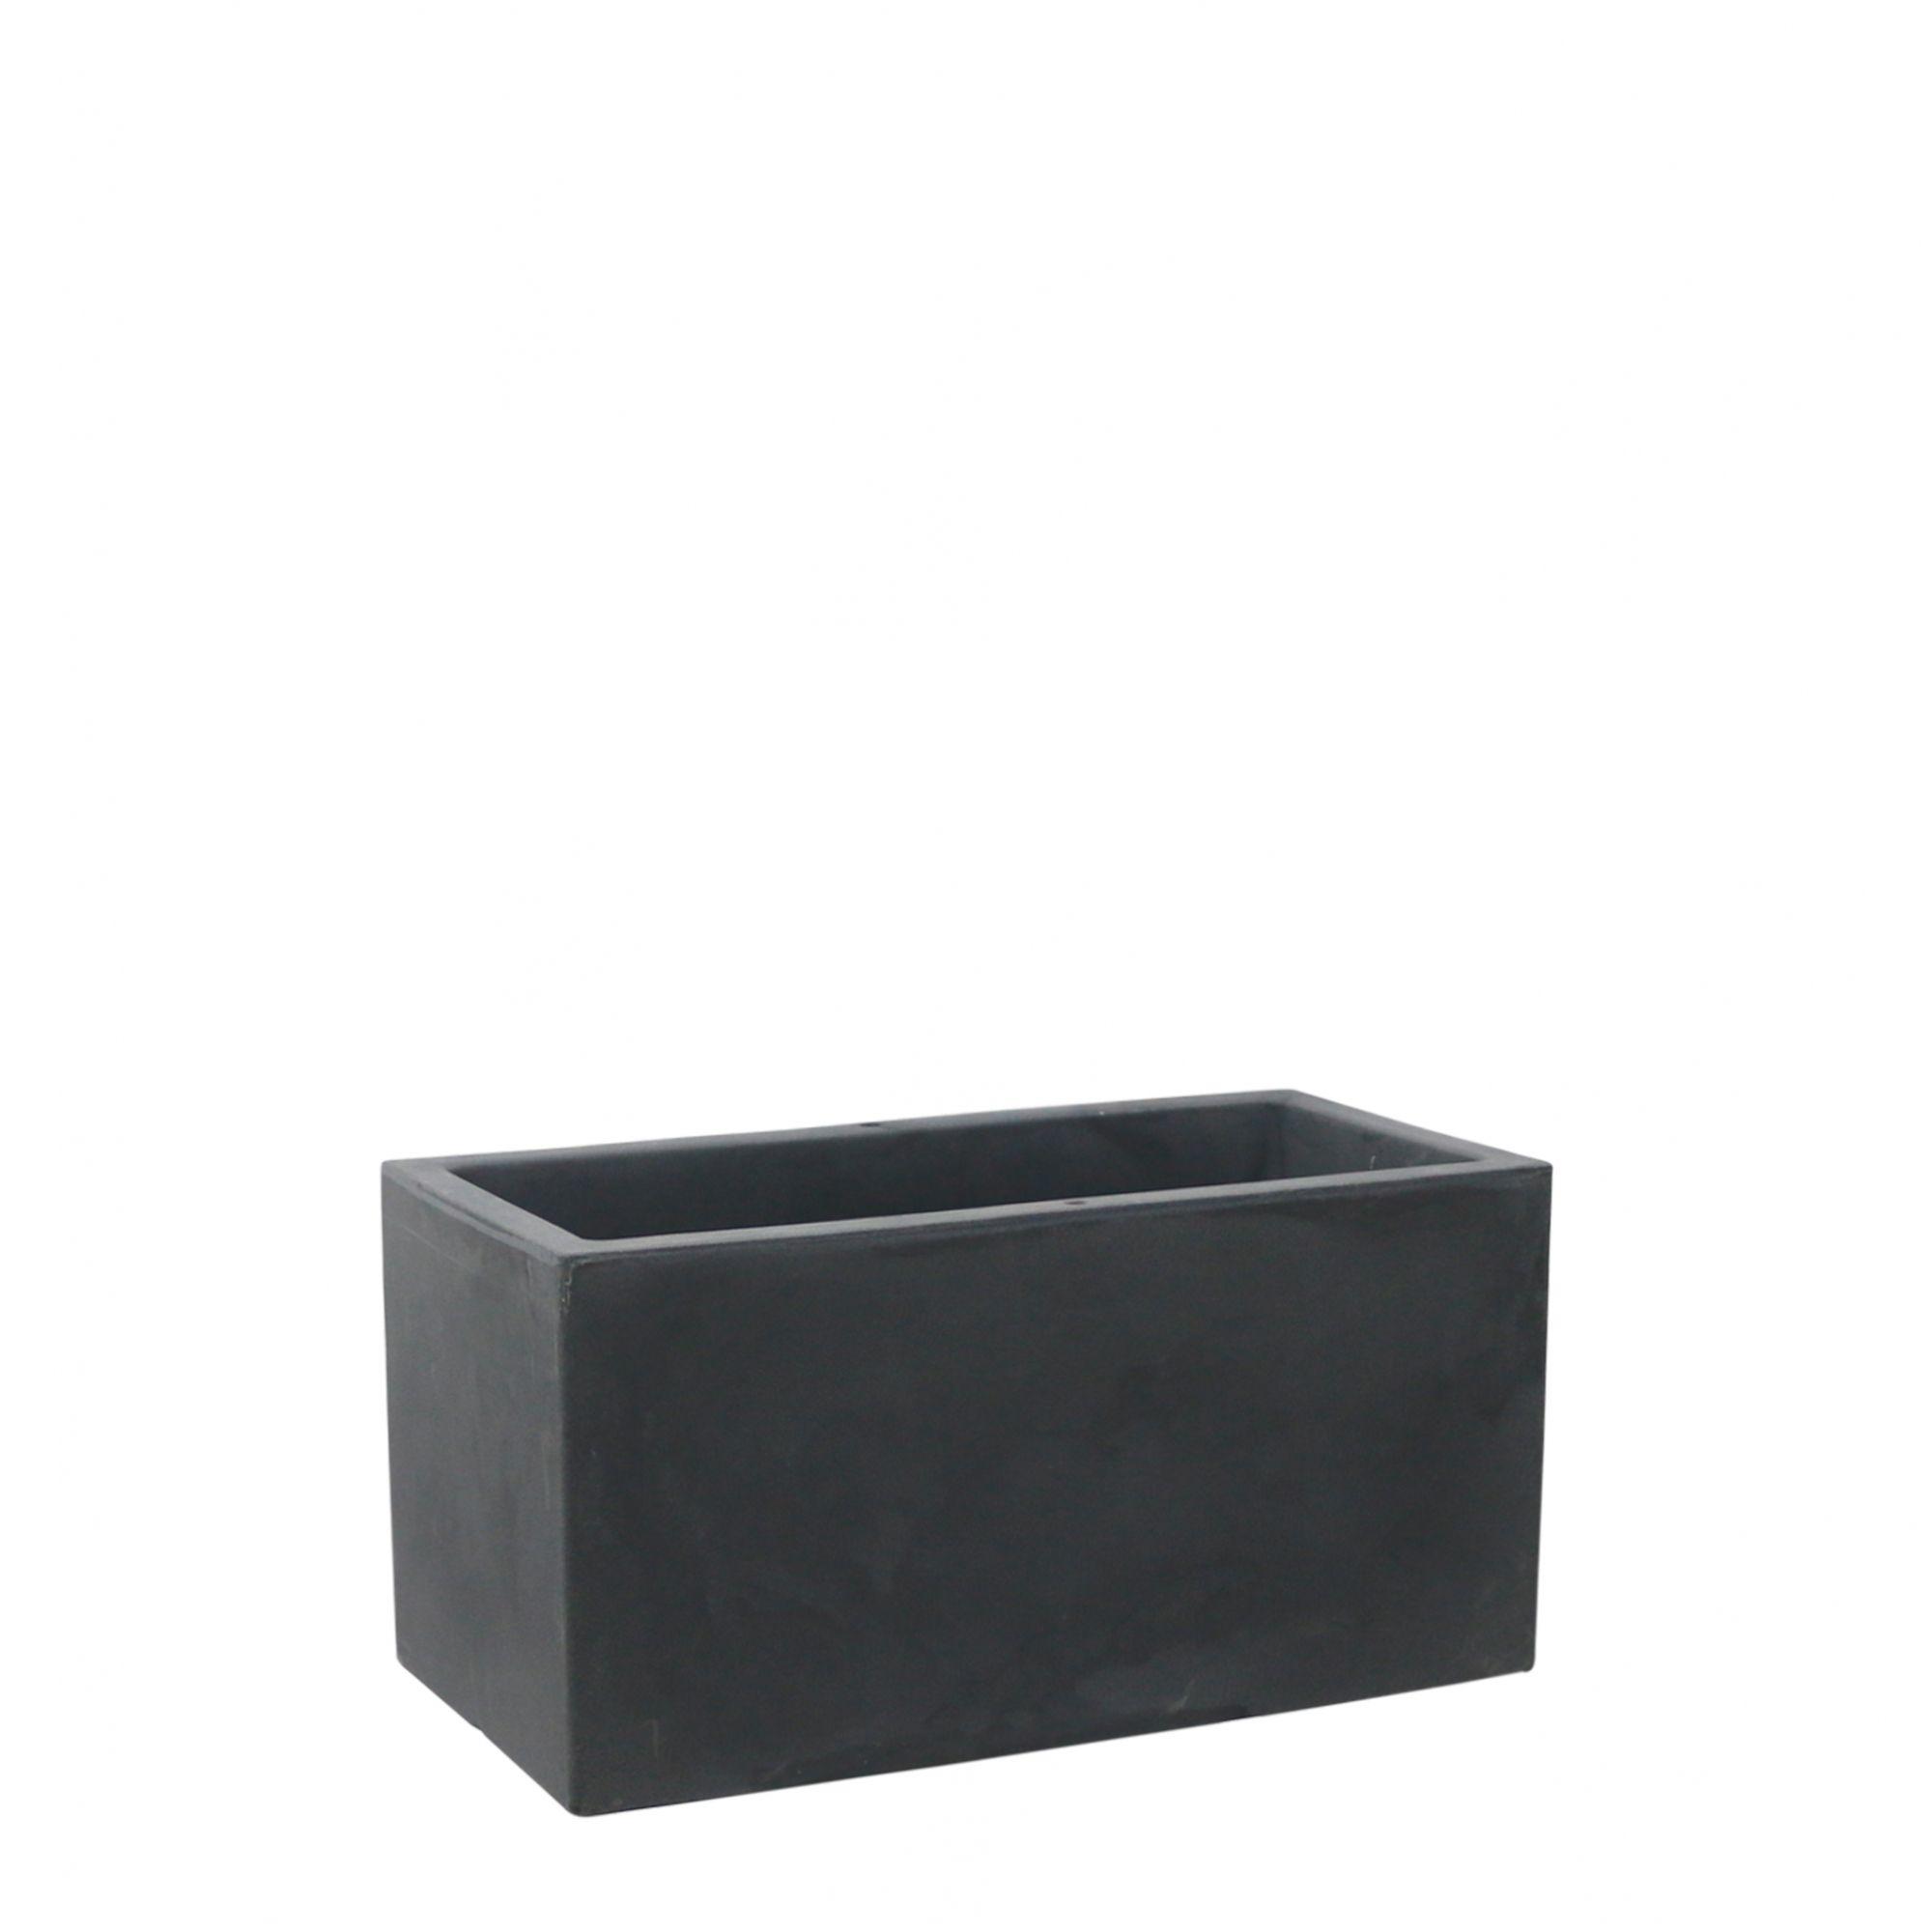 Jardineira Cubo 80 x 40 cm - VASART